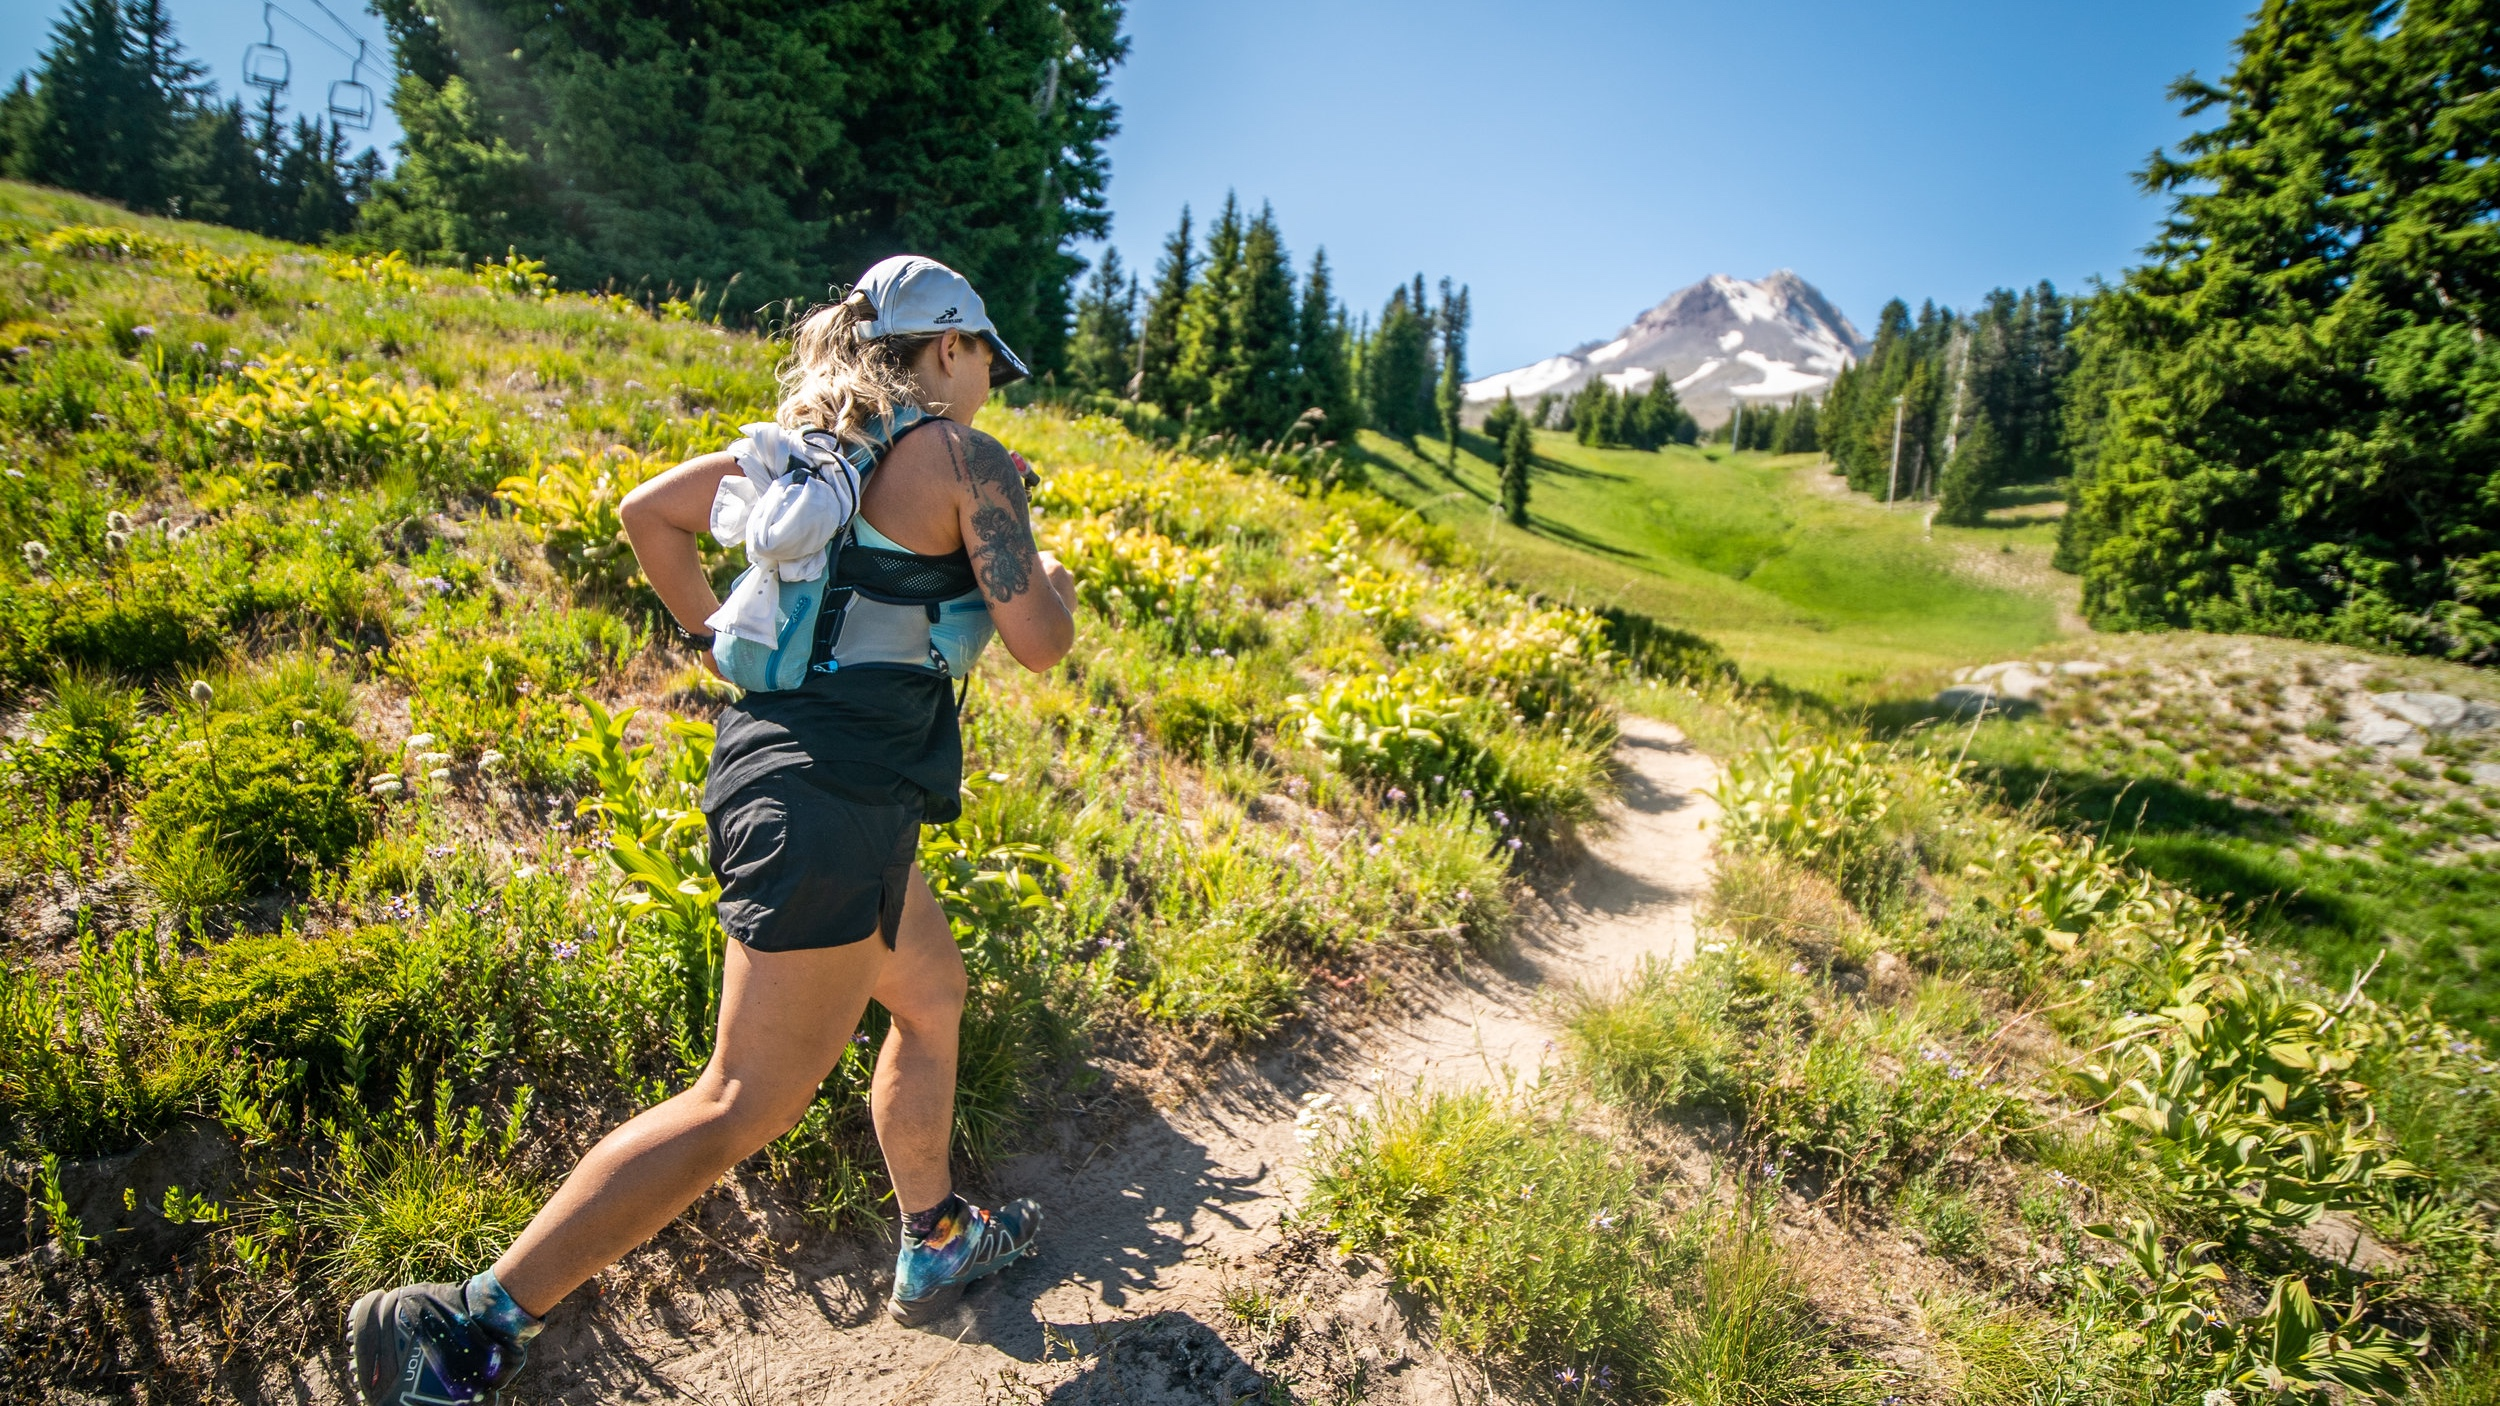 Wy'east Howl - Trail half-marathon course entirely on Mt. Hood!July 26, 2020